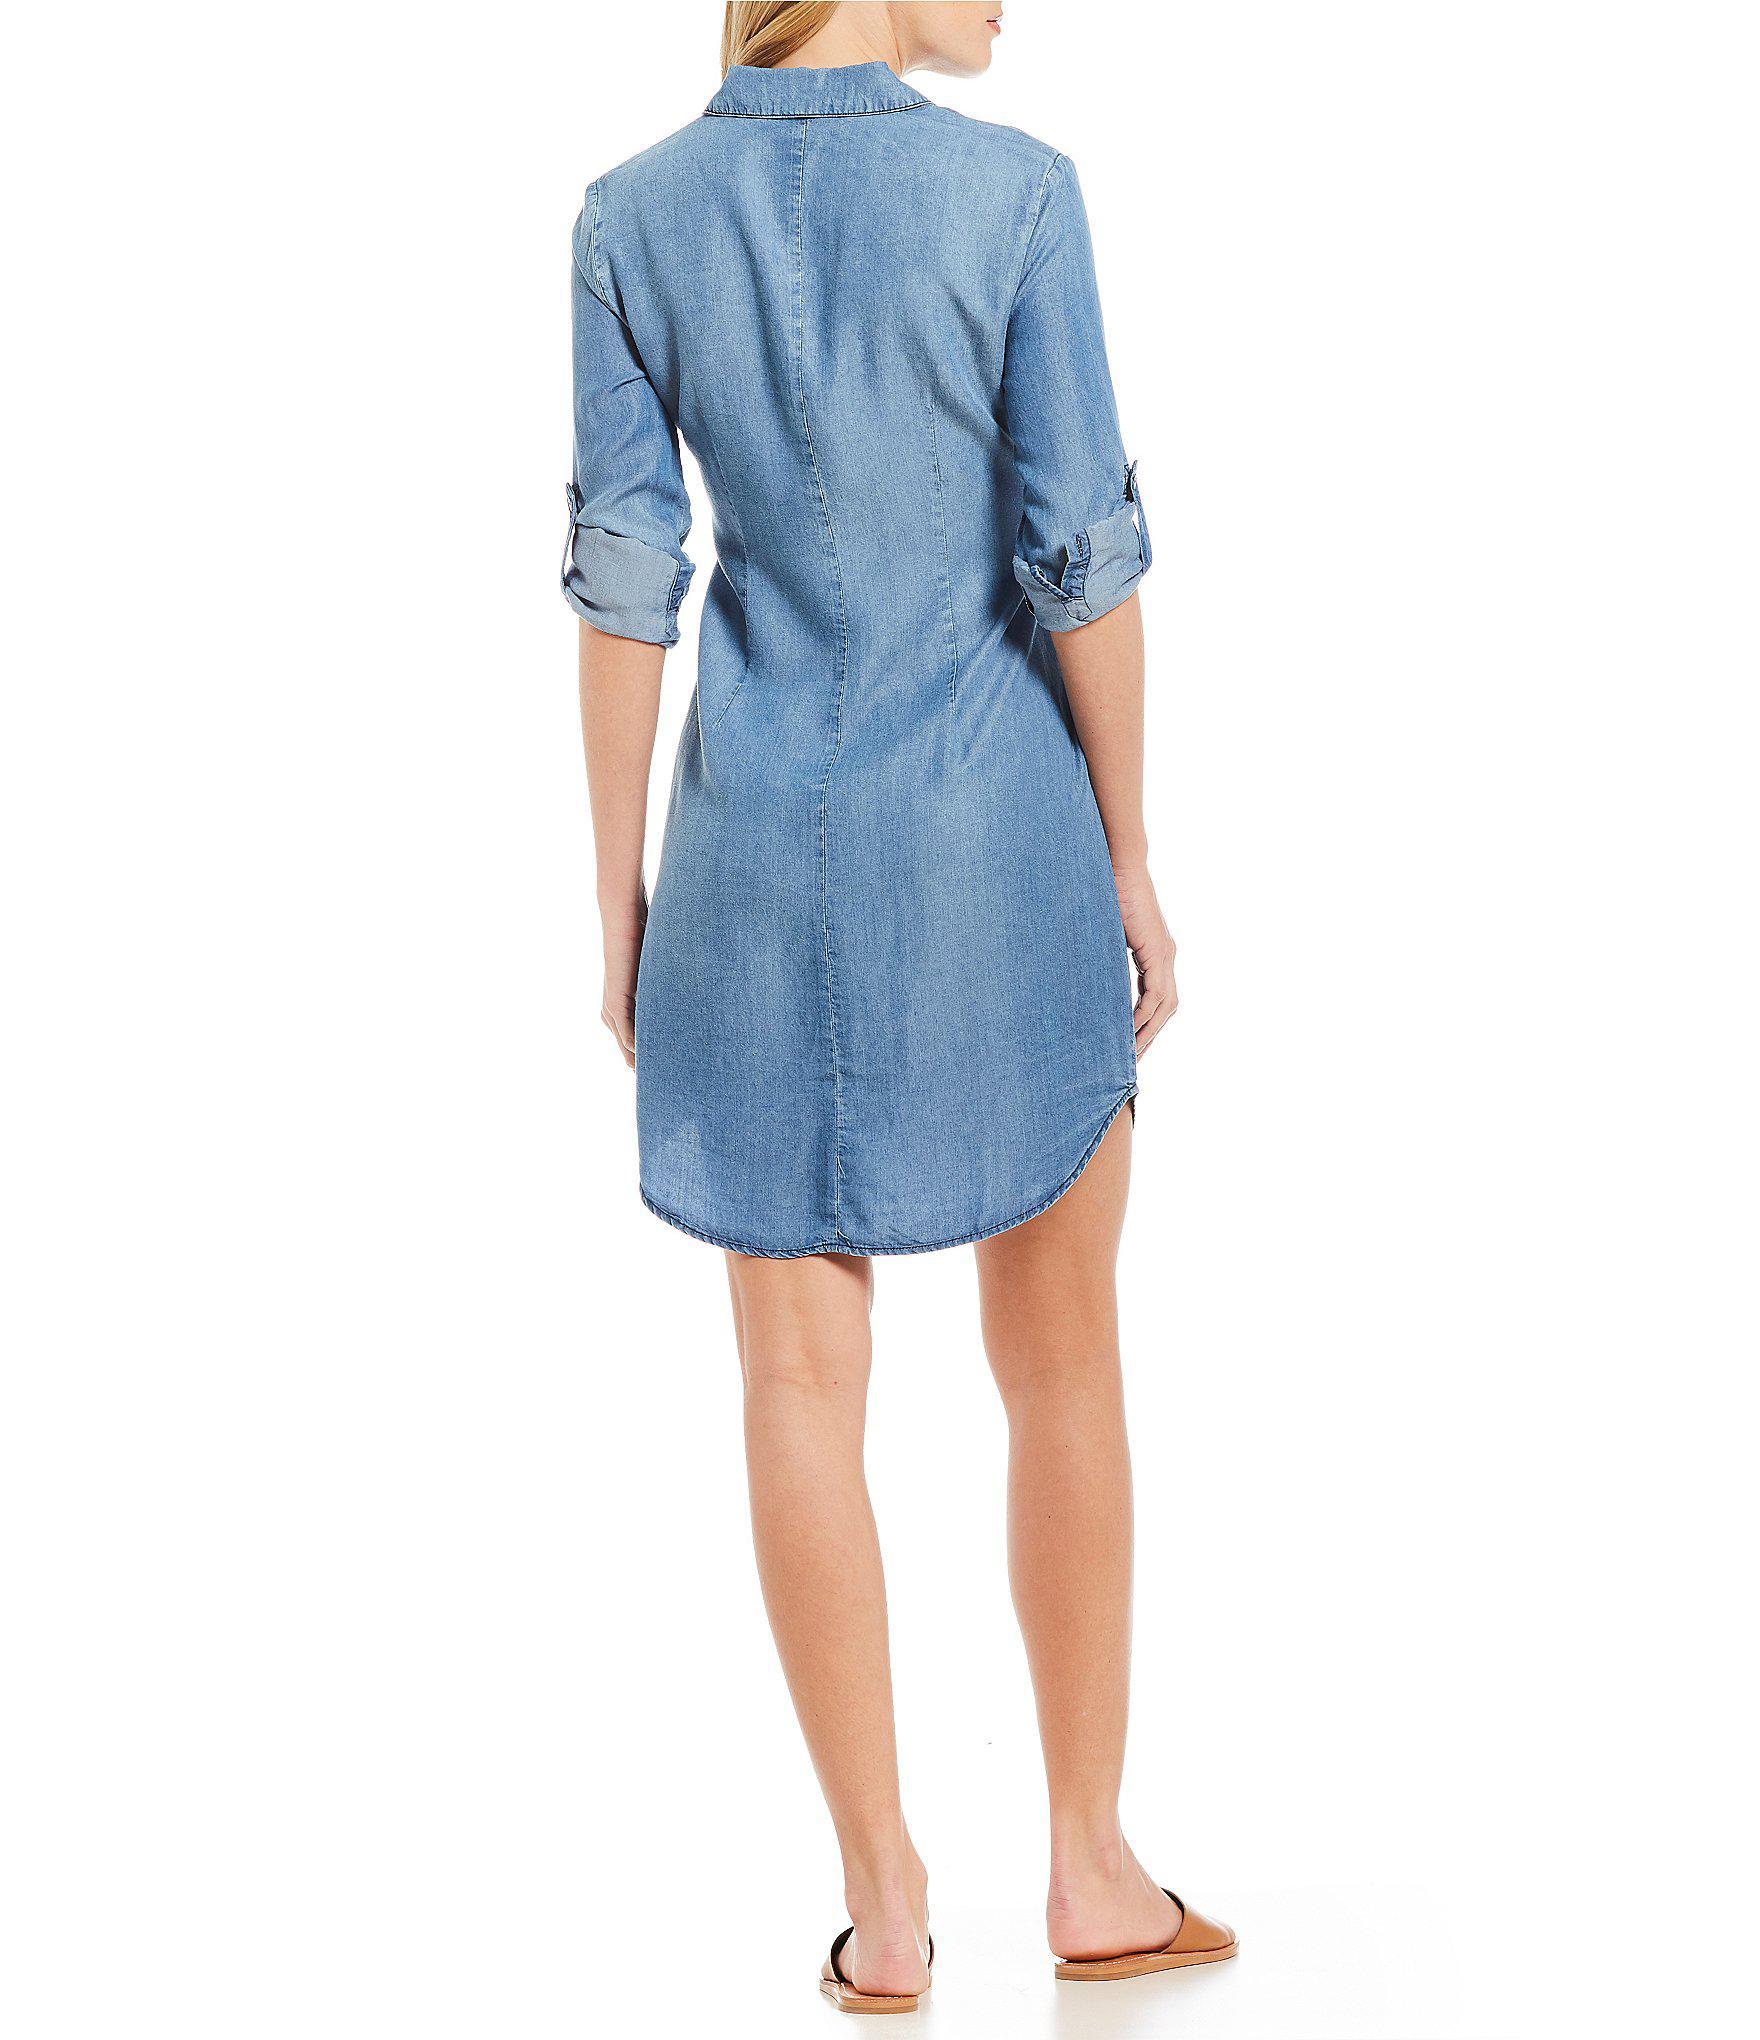 7d49d7f3f1 Cremieux Benjamin Tie Front Denim Chambray Shirt Dress in Blue - Lyst